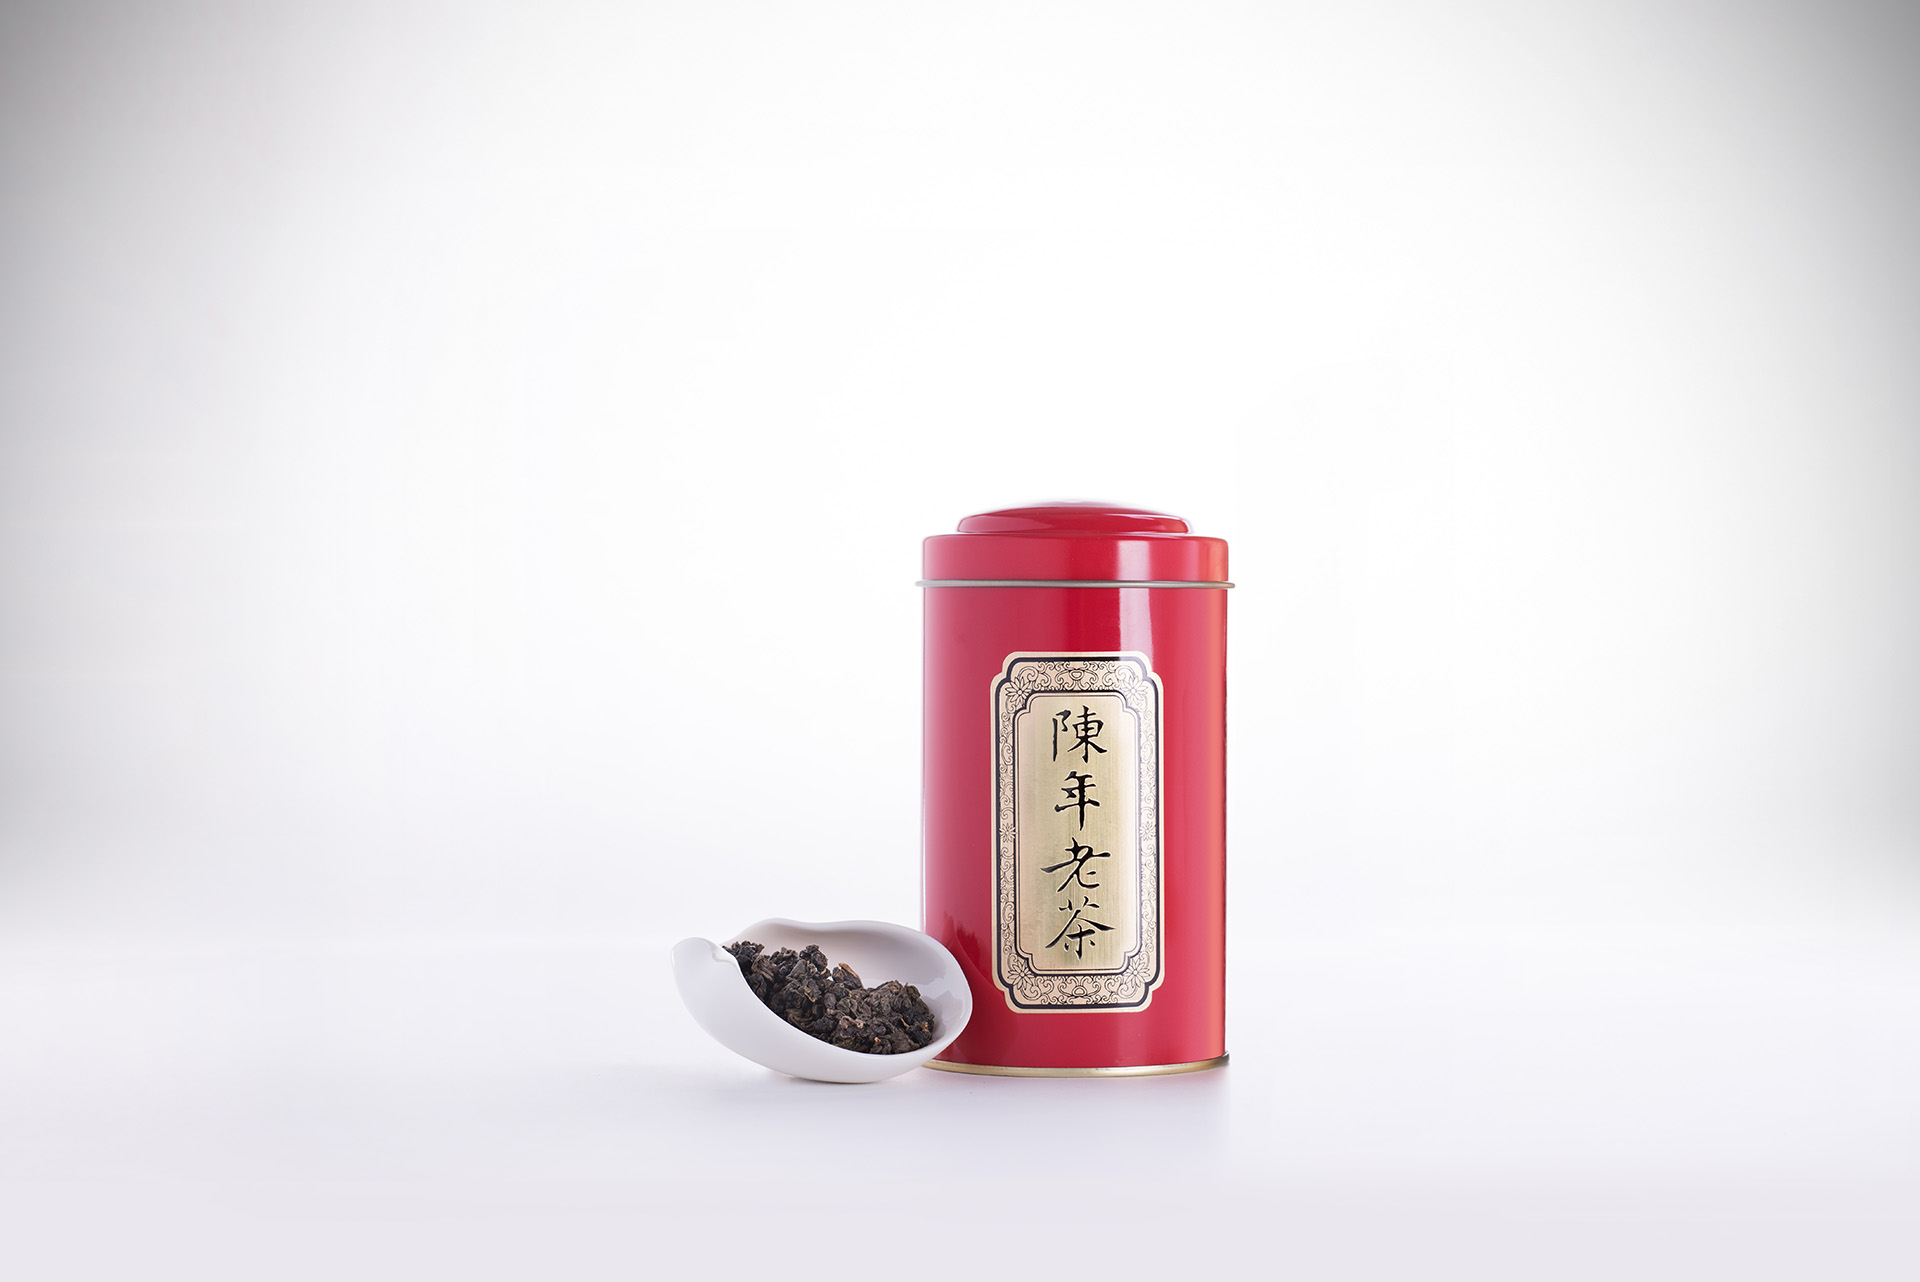 炭焙陳年老茶